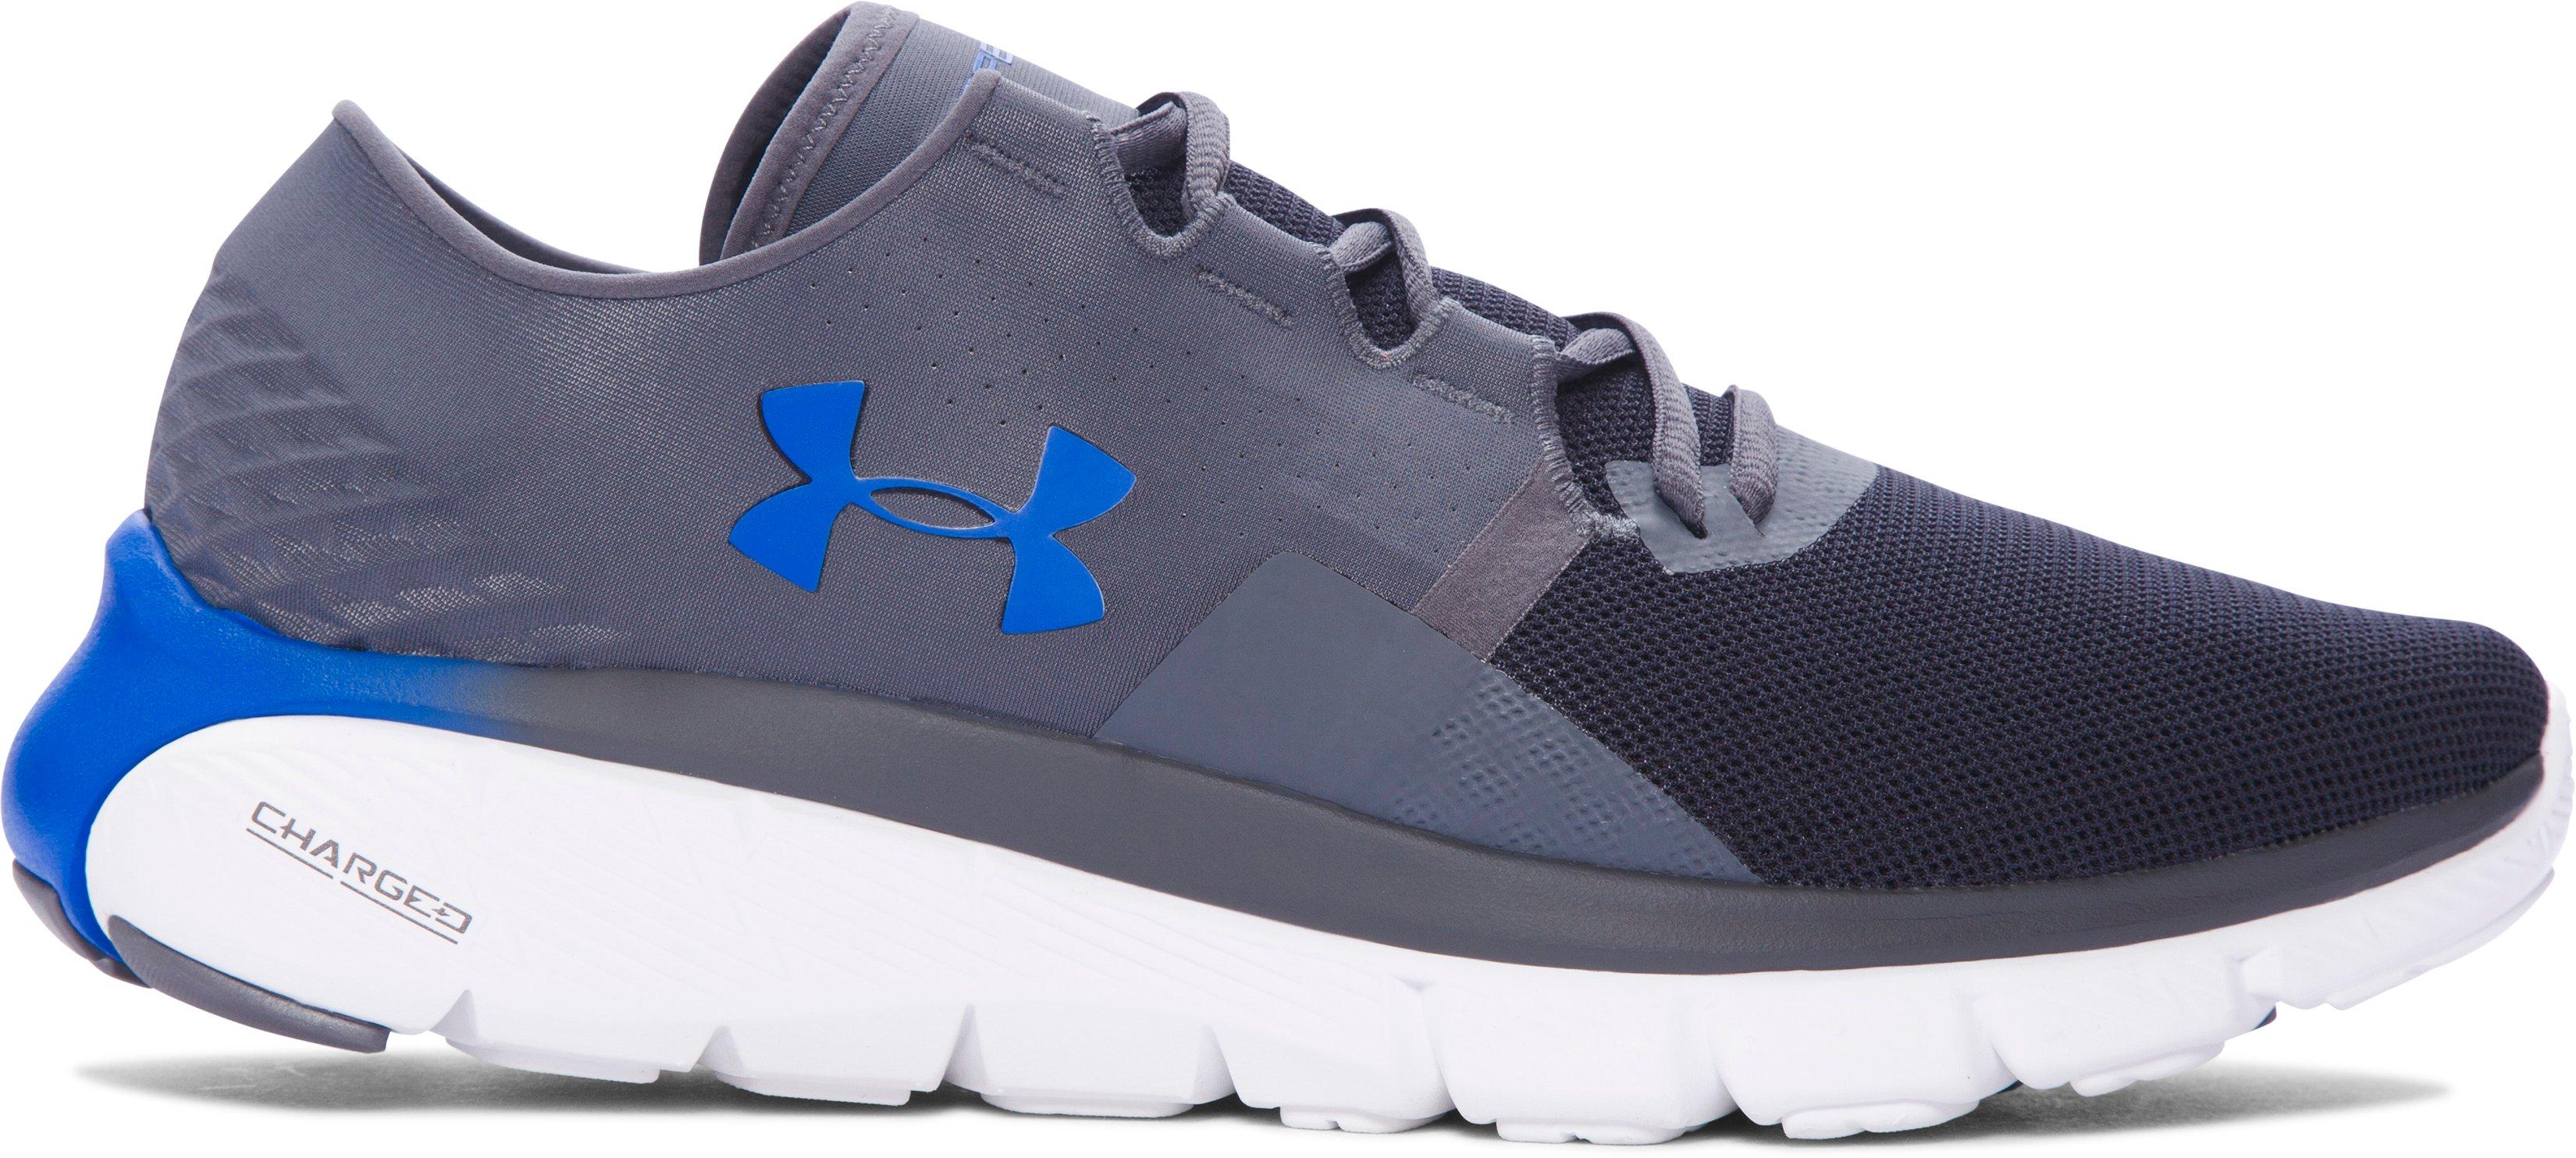 men u0027s ua speedform fortis 2 1 running shoes under armour us